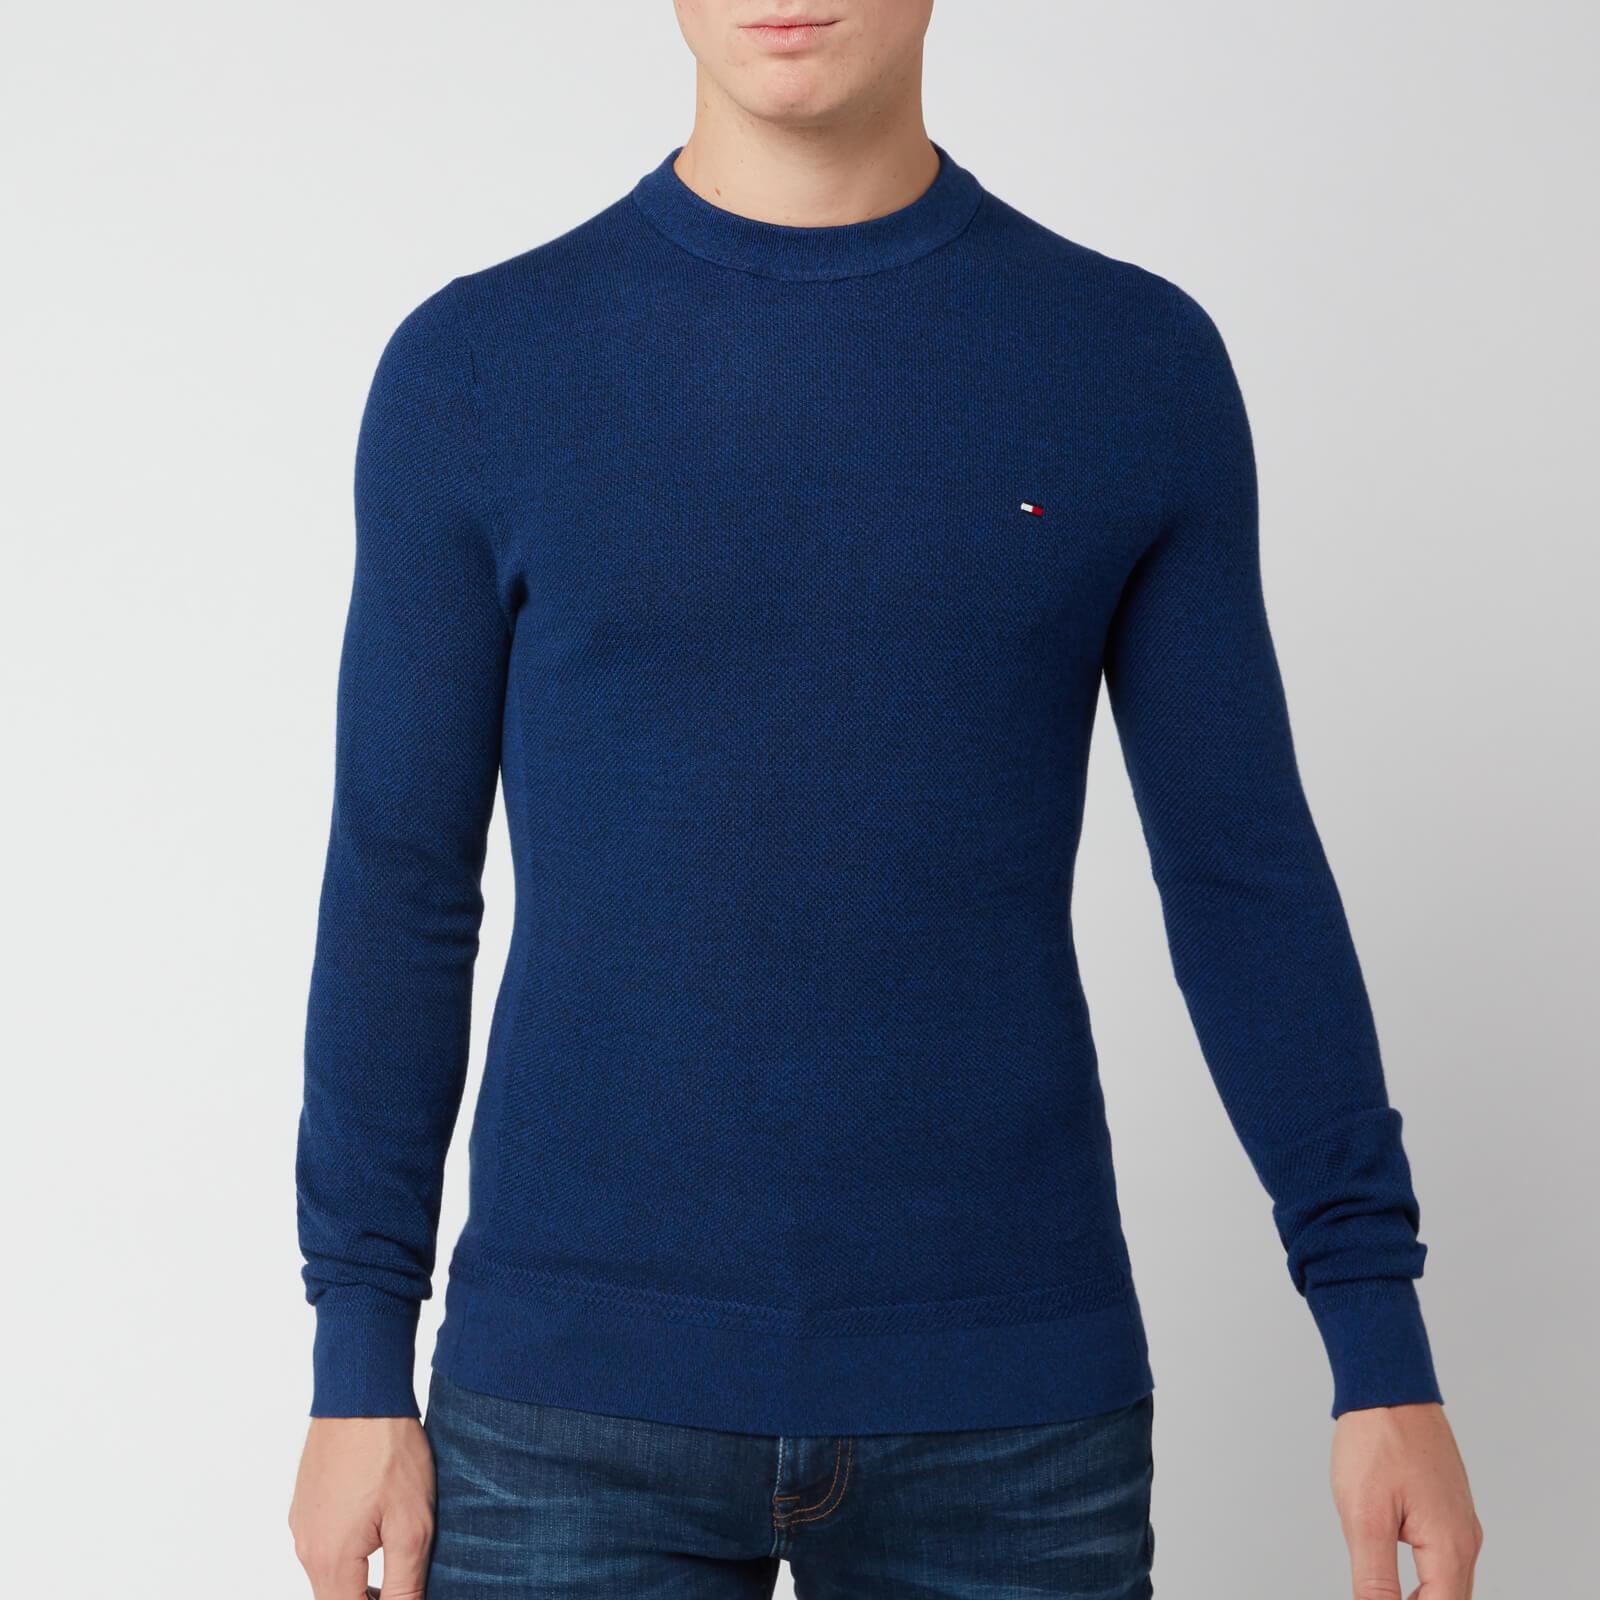 Tommy Hilfiger Men's Mouline Ricecorn Jumper - Blue Quartz - L - Blue